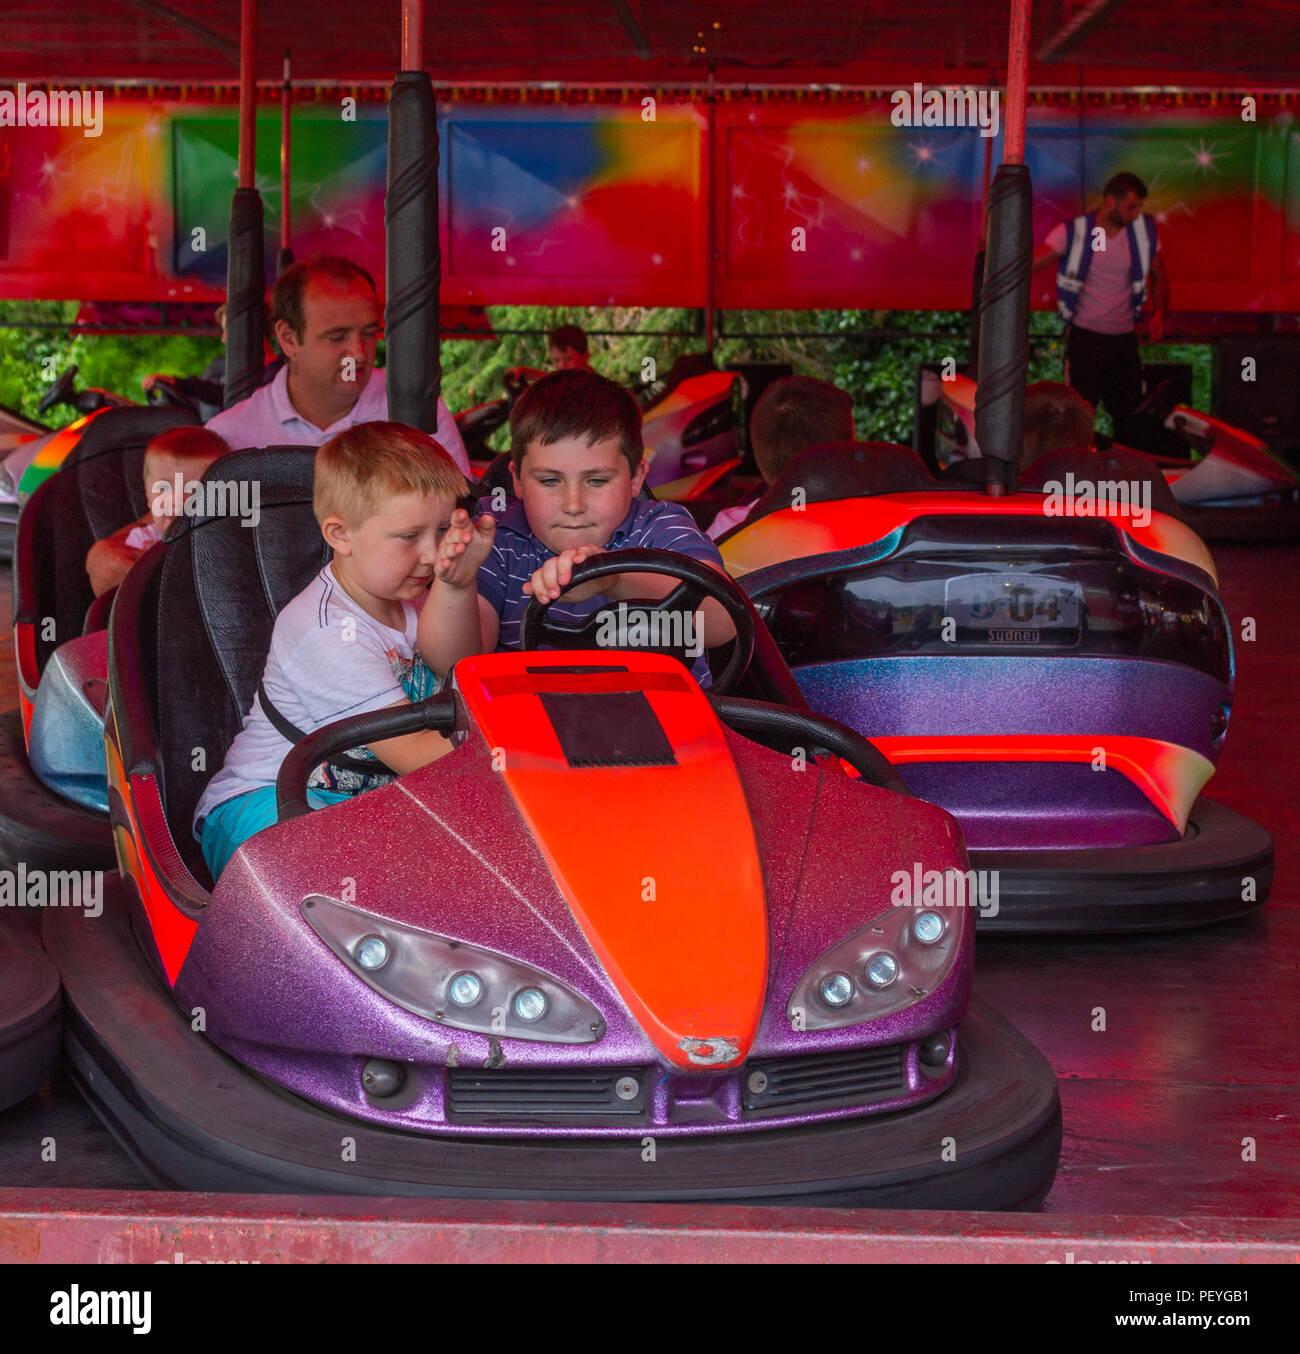 children-riding-the-dodgems-or-bumper-cars-on-a-fairground-ride-PEYGB1.jpg